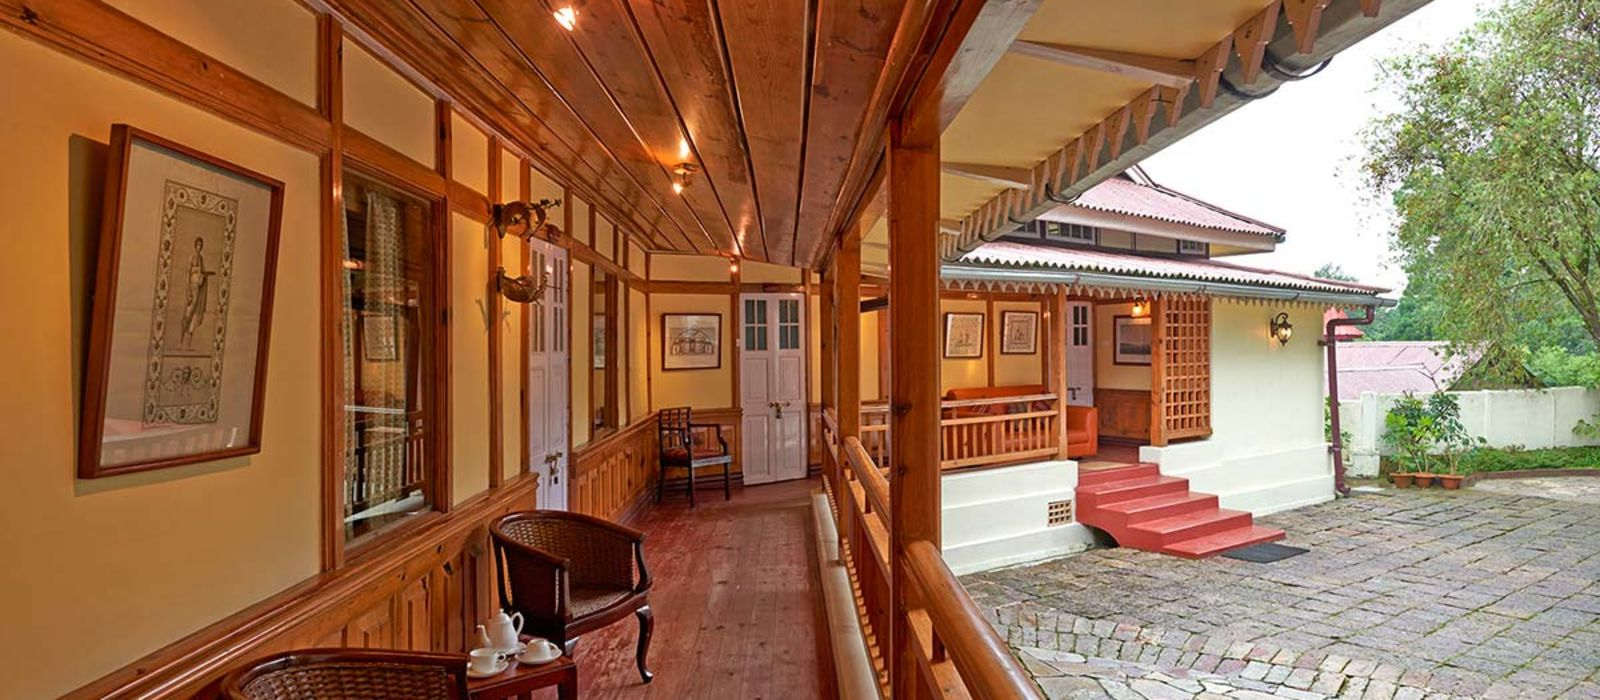 Hotel Tripura Castle East India